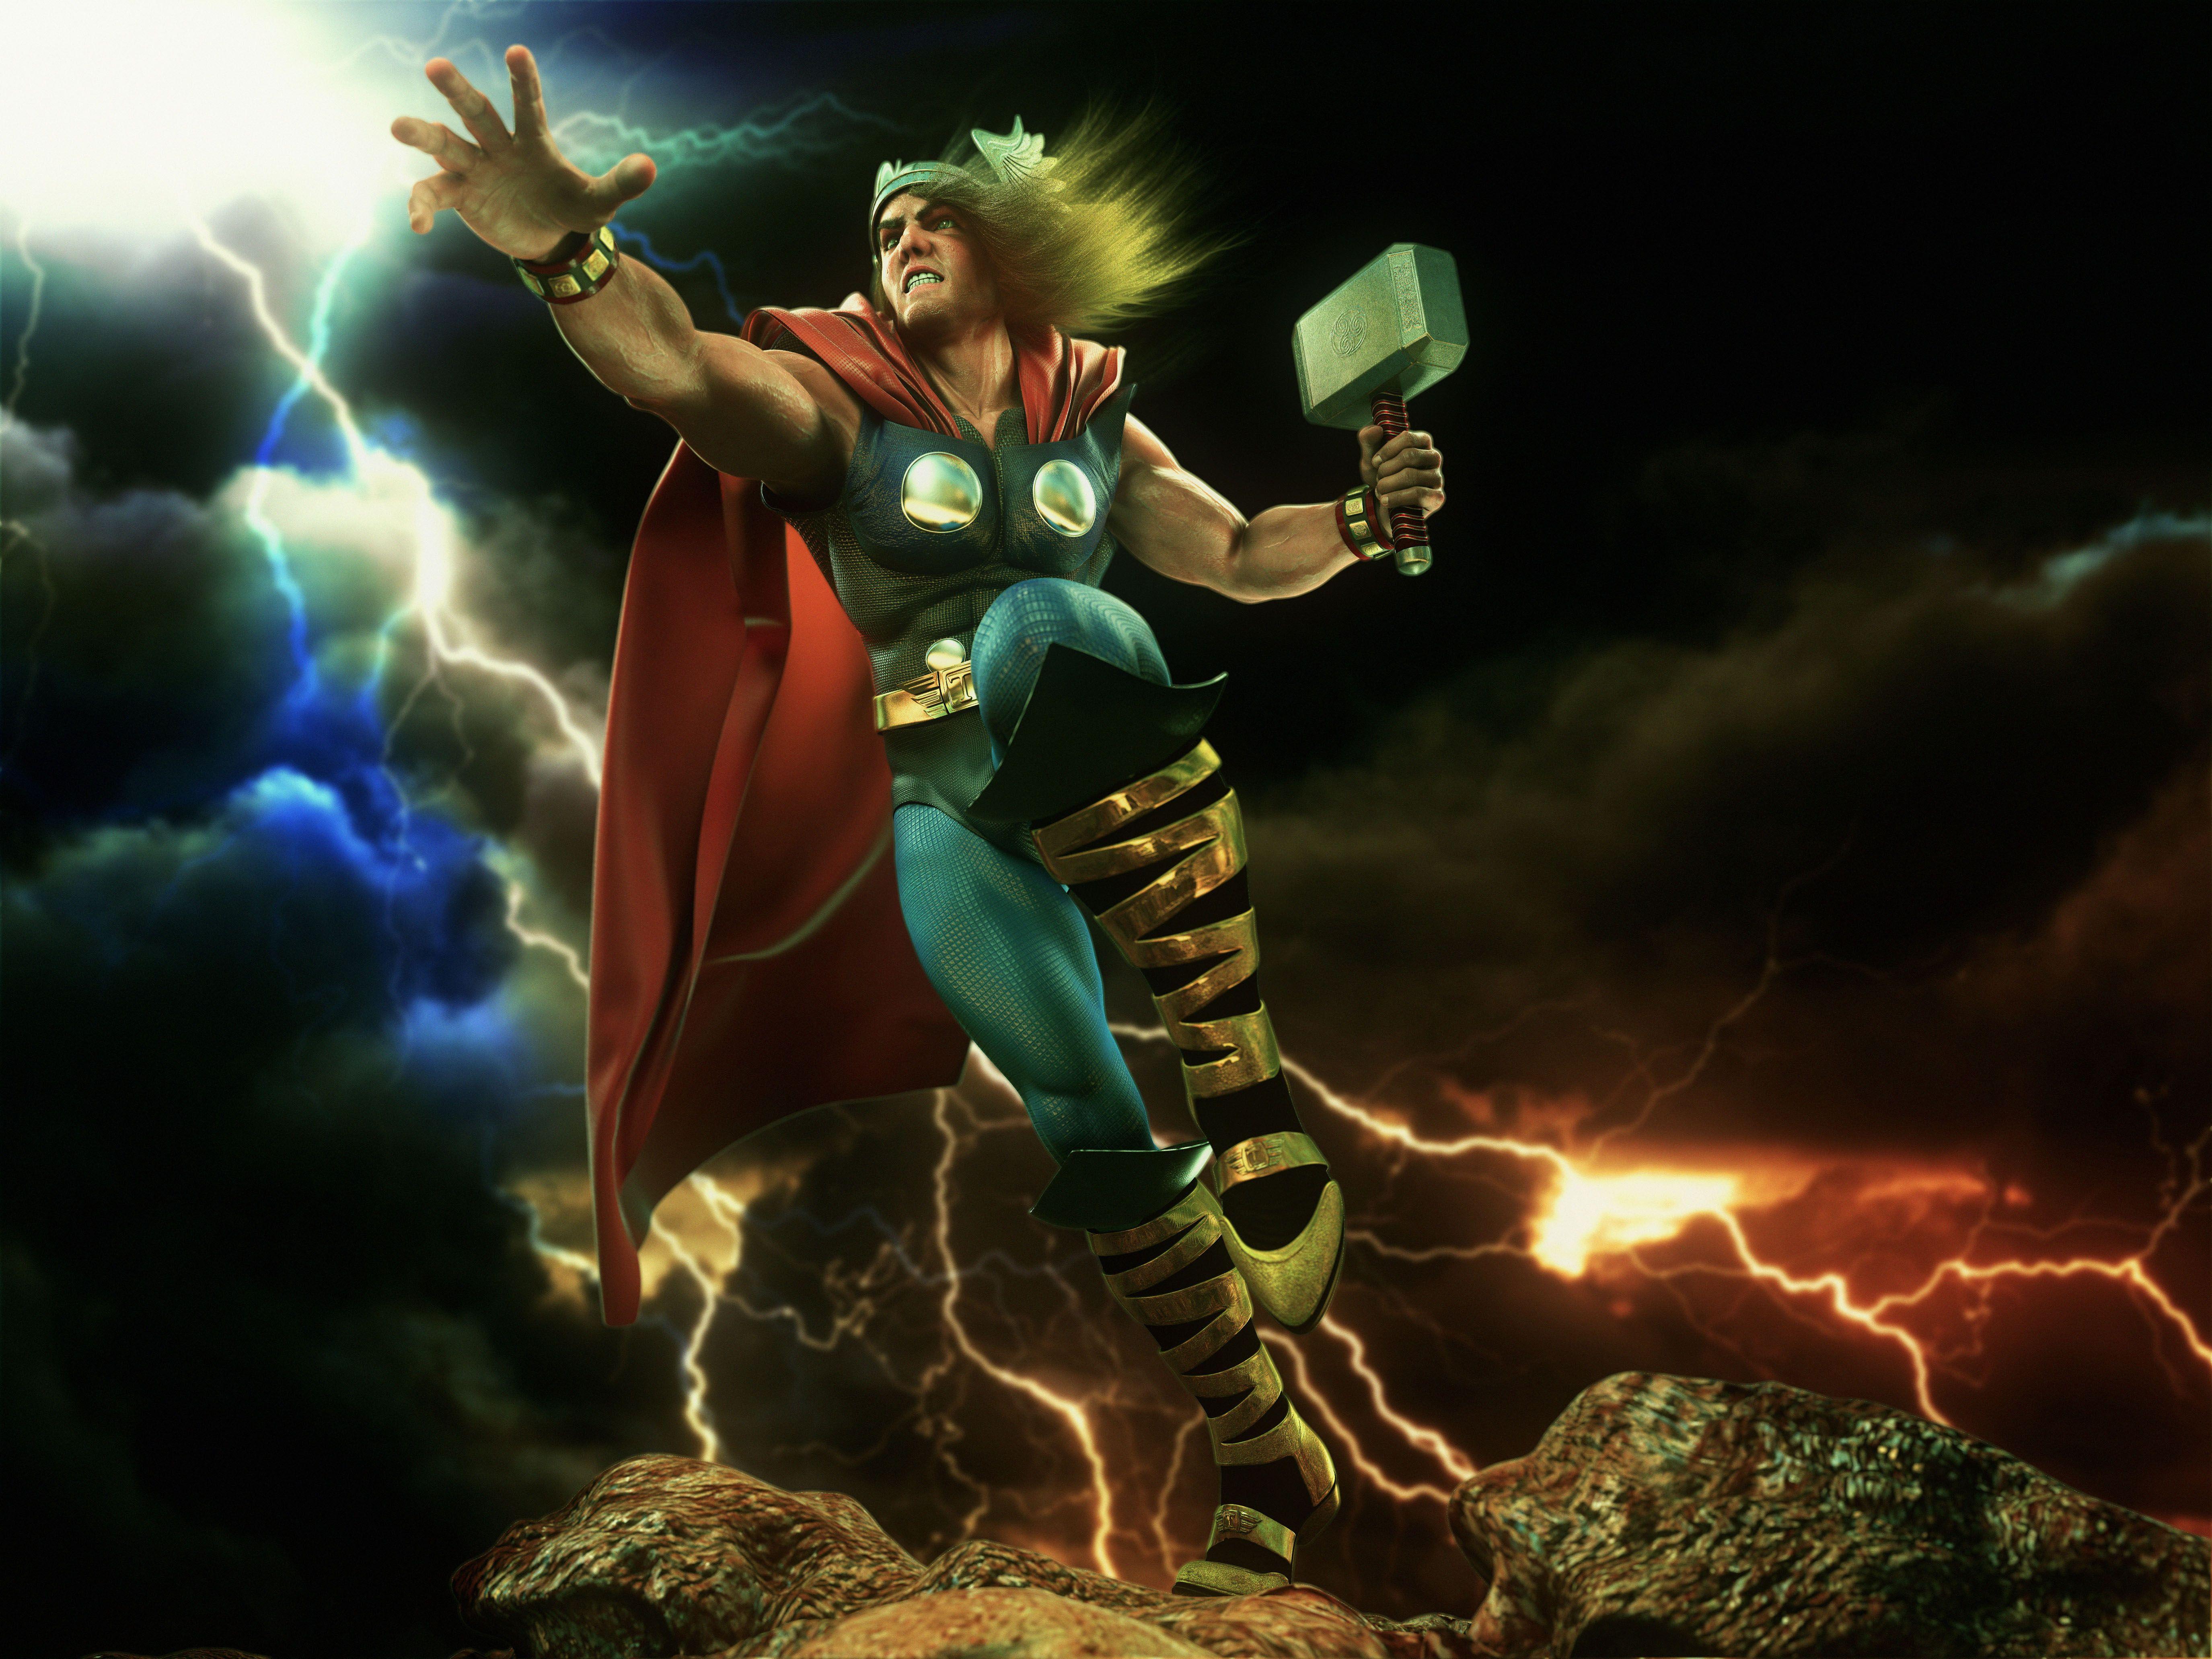 Thor digital art hd superheroes 4k wallpapers images - Thor art wallpaper ...